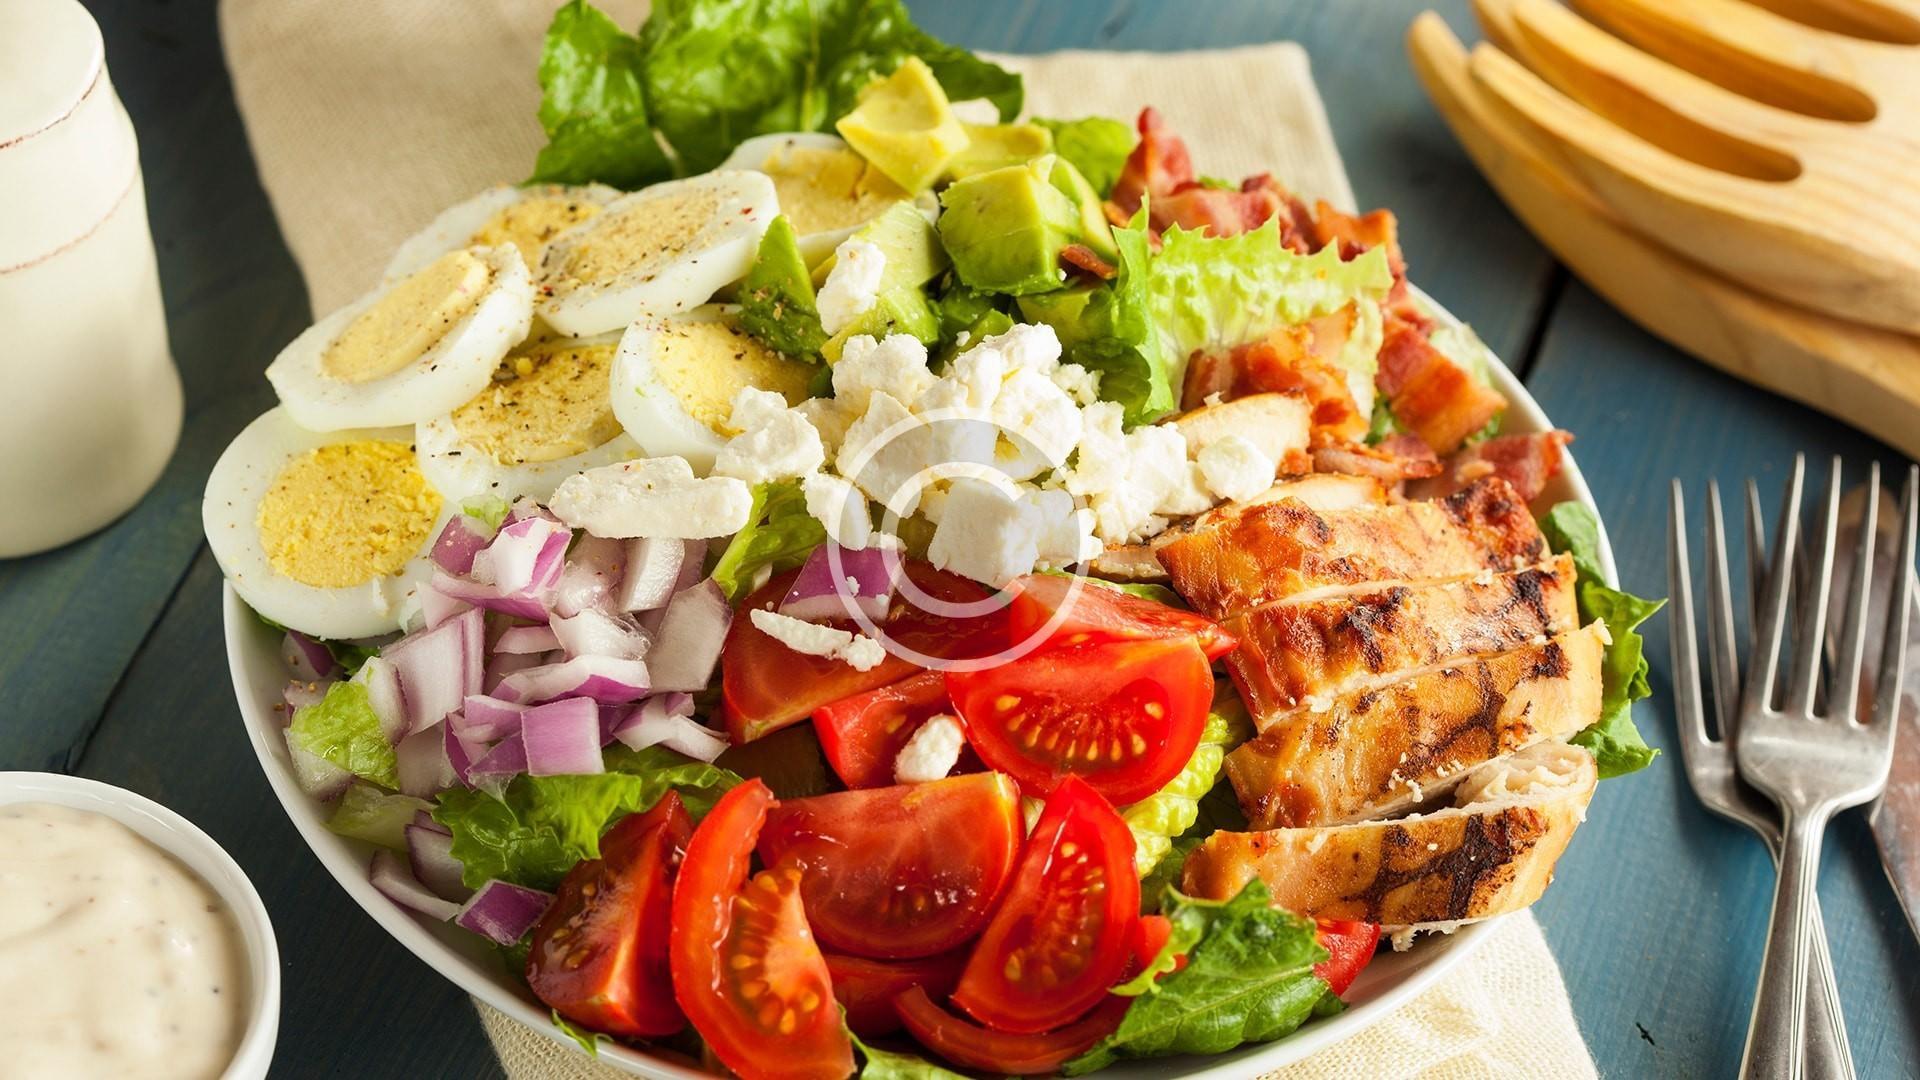 Egg and Tuna Salad